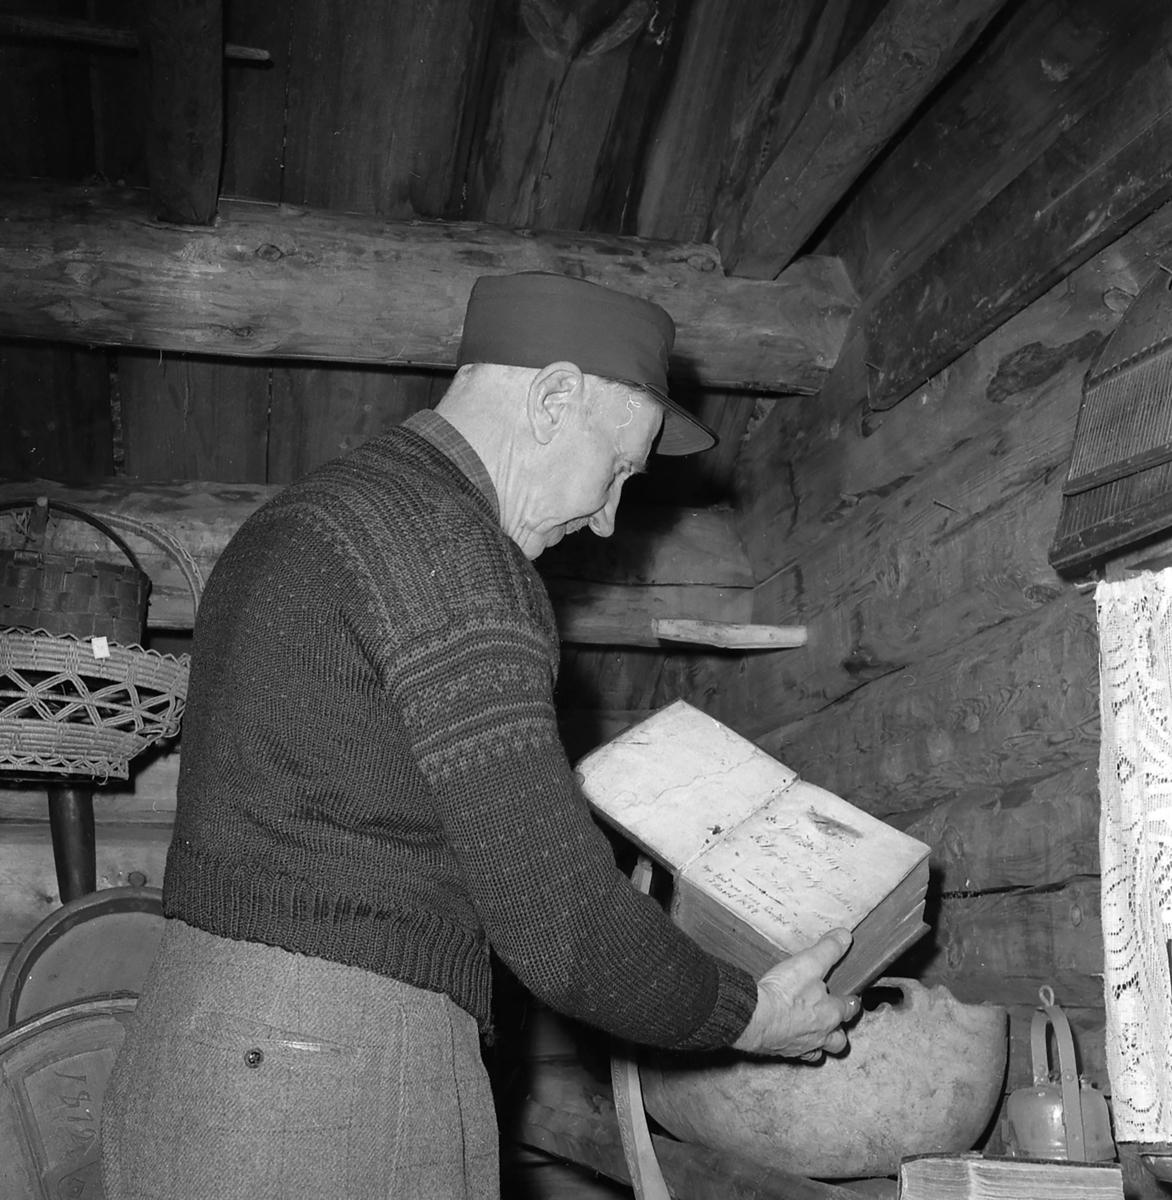 Iver Eide,fjellbonden og bygdehistorikeren fra Tolga med sin gårdssamling på stabbur